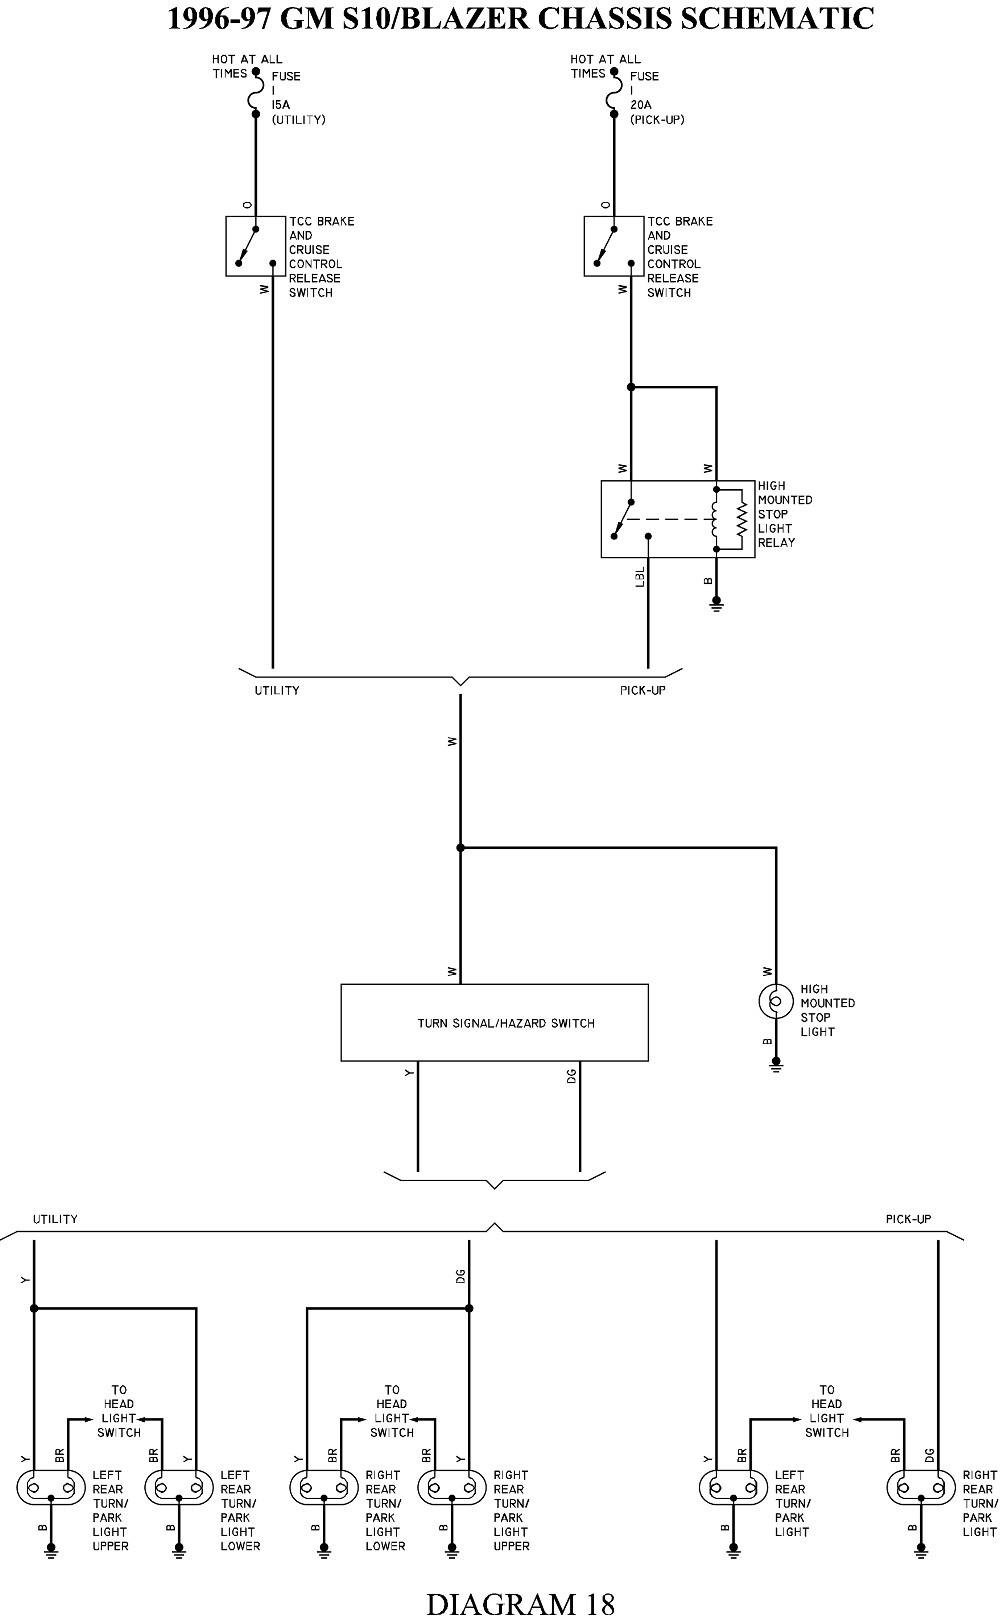 1995 chevy 1500 trailer wiring diagram rv plug wiring diagram 95 chevy wiring diagram  rv plug wiring diagram 95 chevy